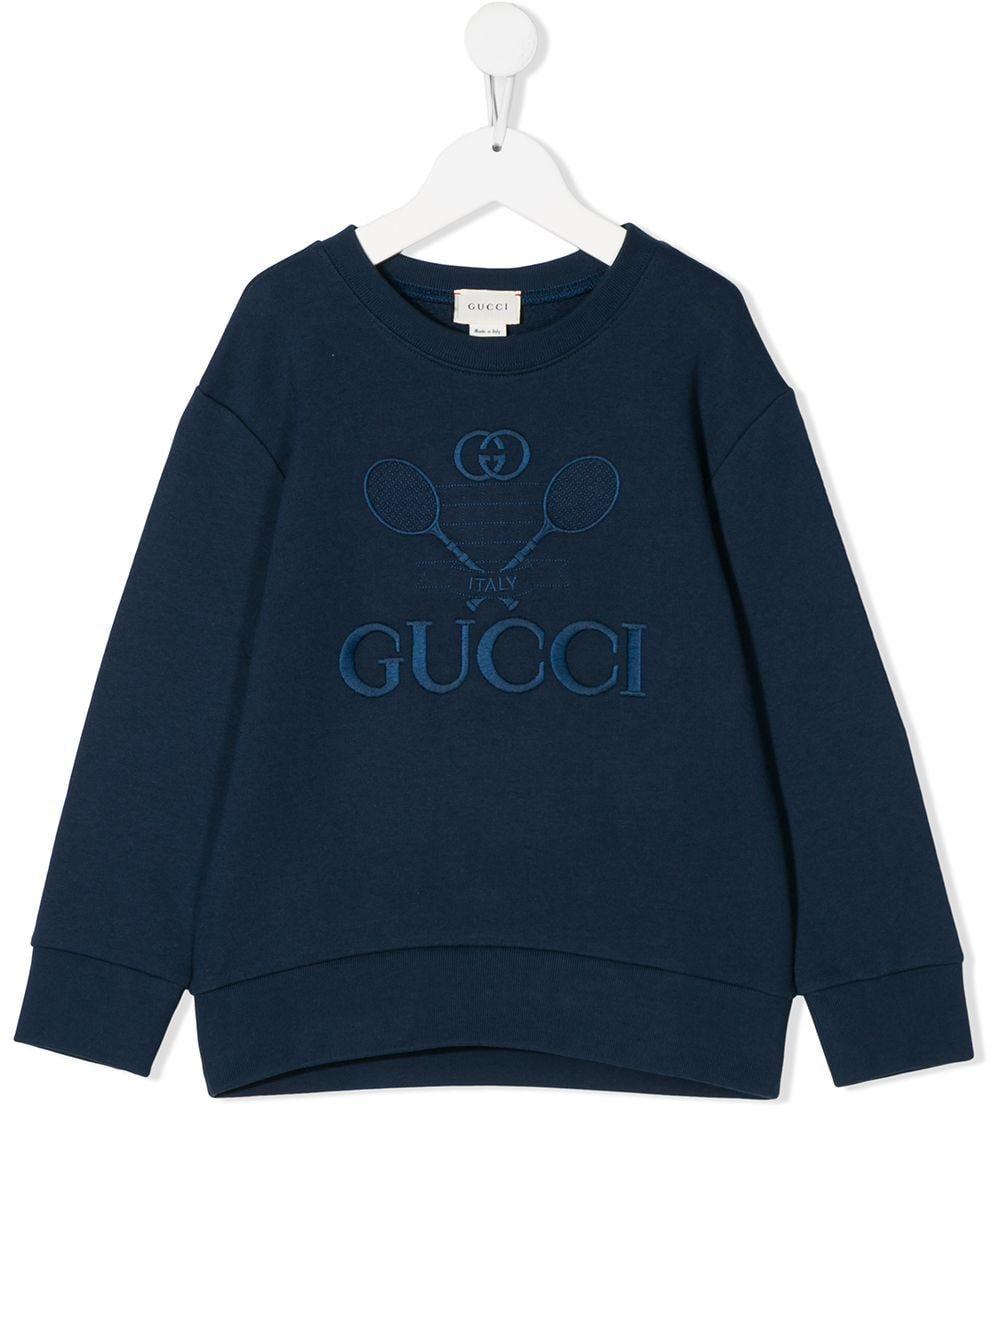 Gucci Kids Embroidered Logo Sweatshirt Farfetch In 2021 Vintage Nike Sweatshirt Vintage Crewneck Sweatshirt Sweatshirts [ 1334 x 1000 Pixel ]